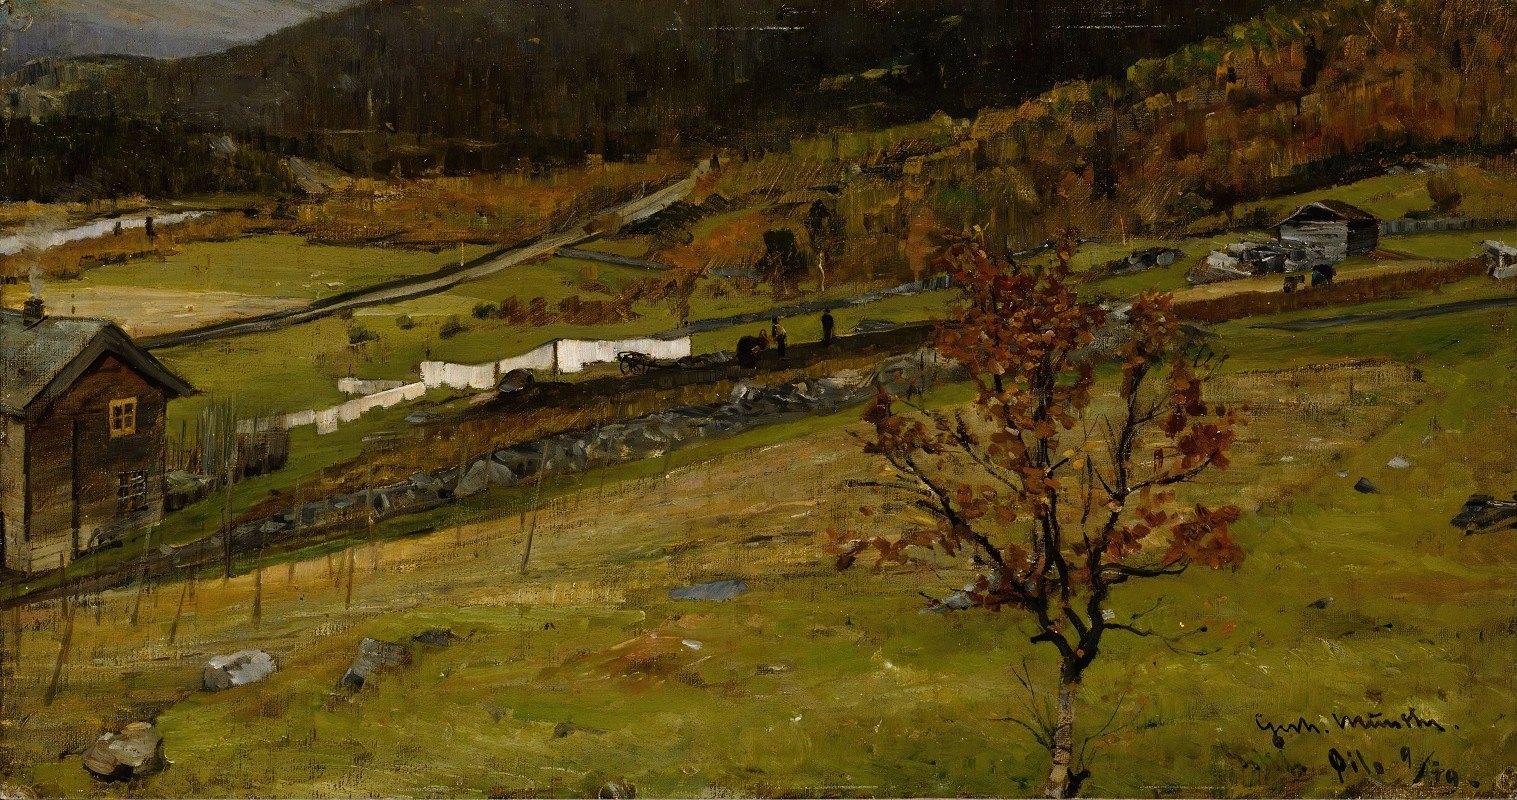 Gerhard Munthe - Autumn Landscape, Øylo